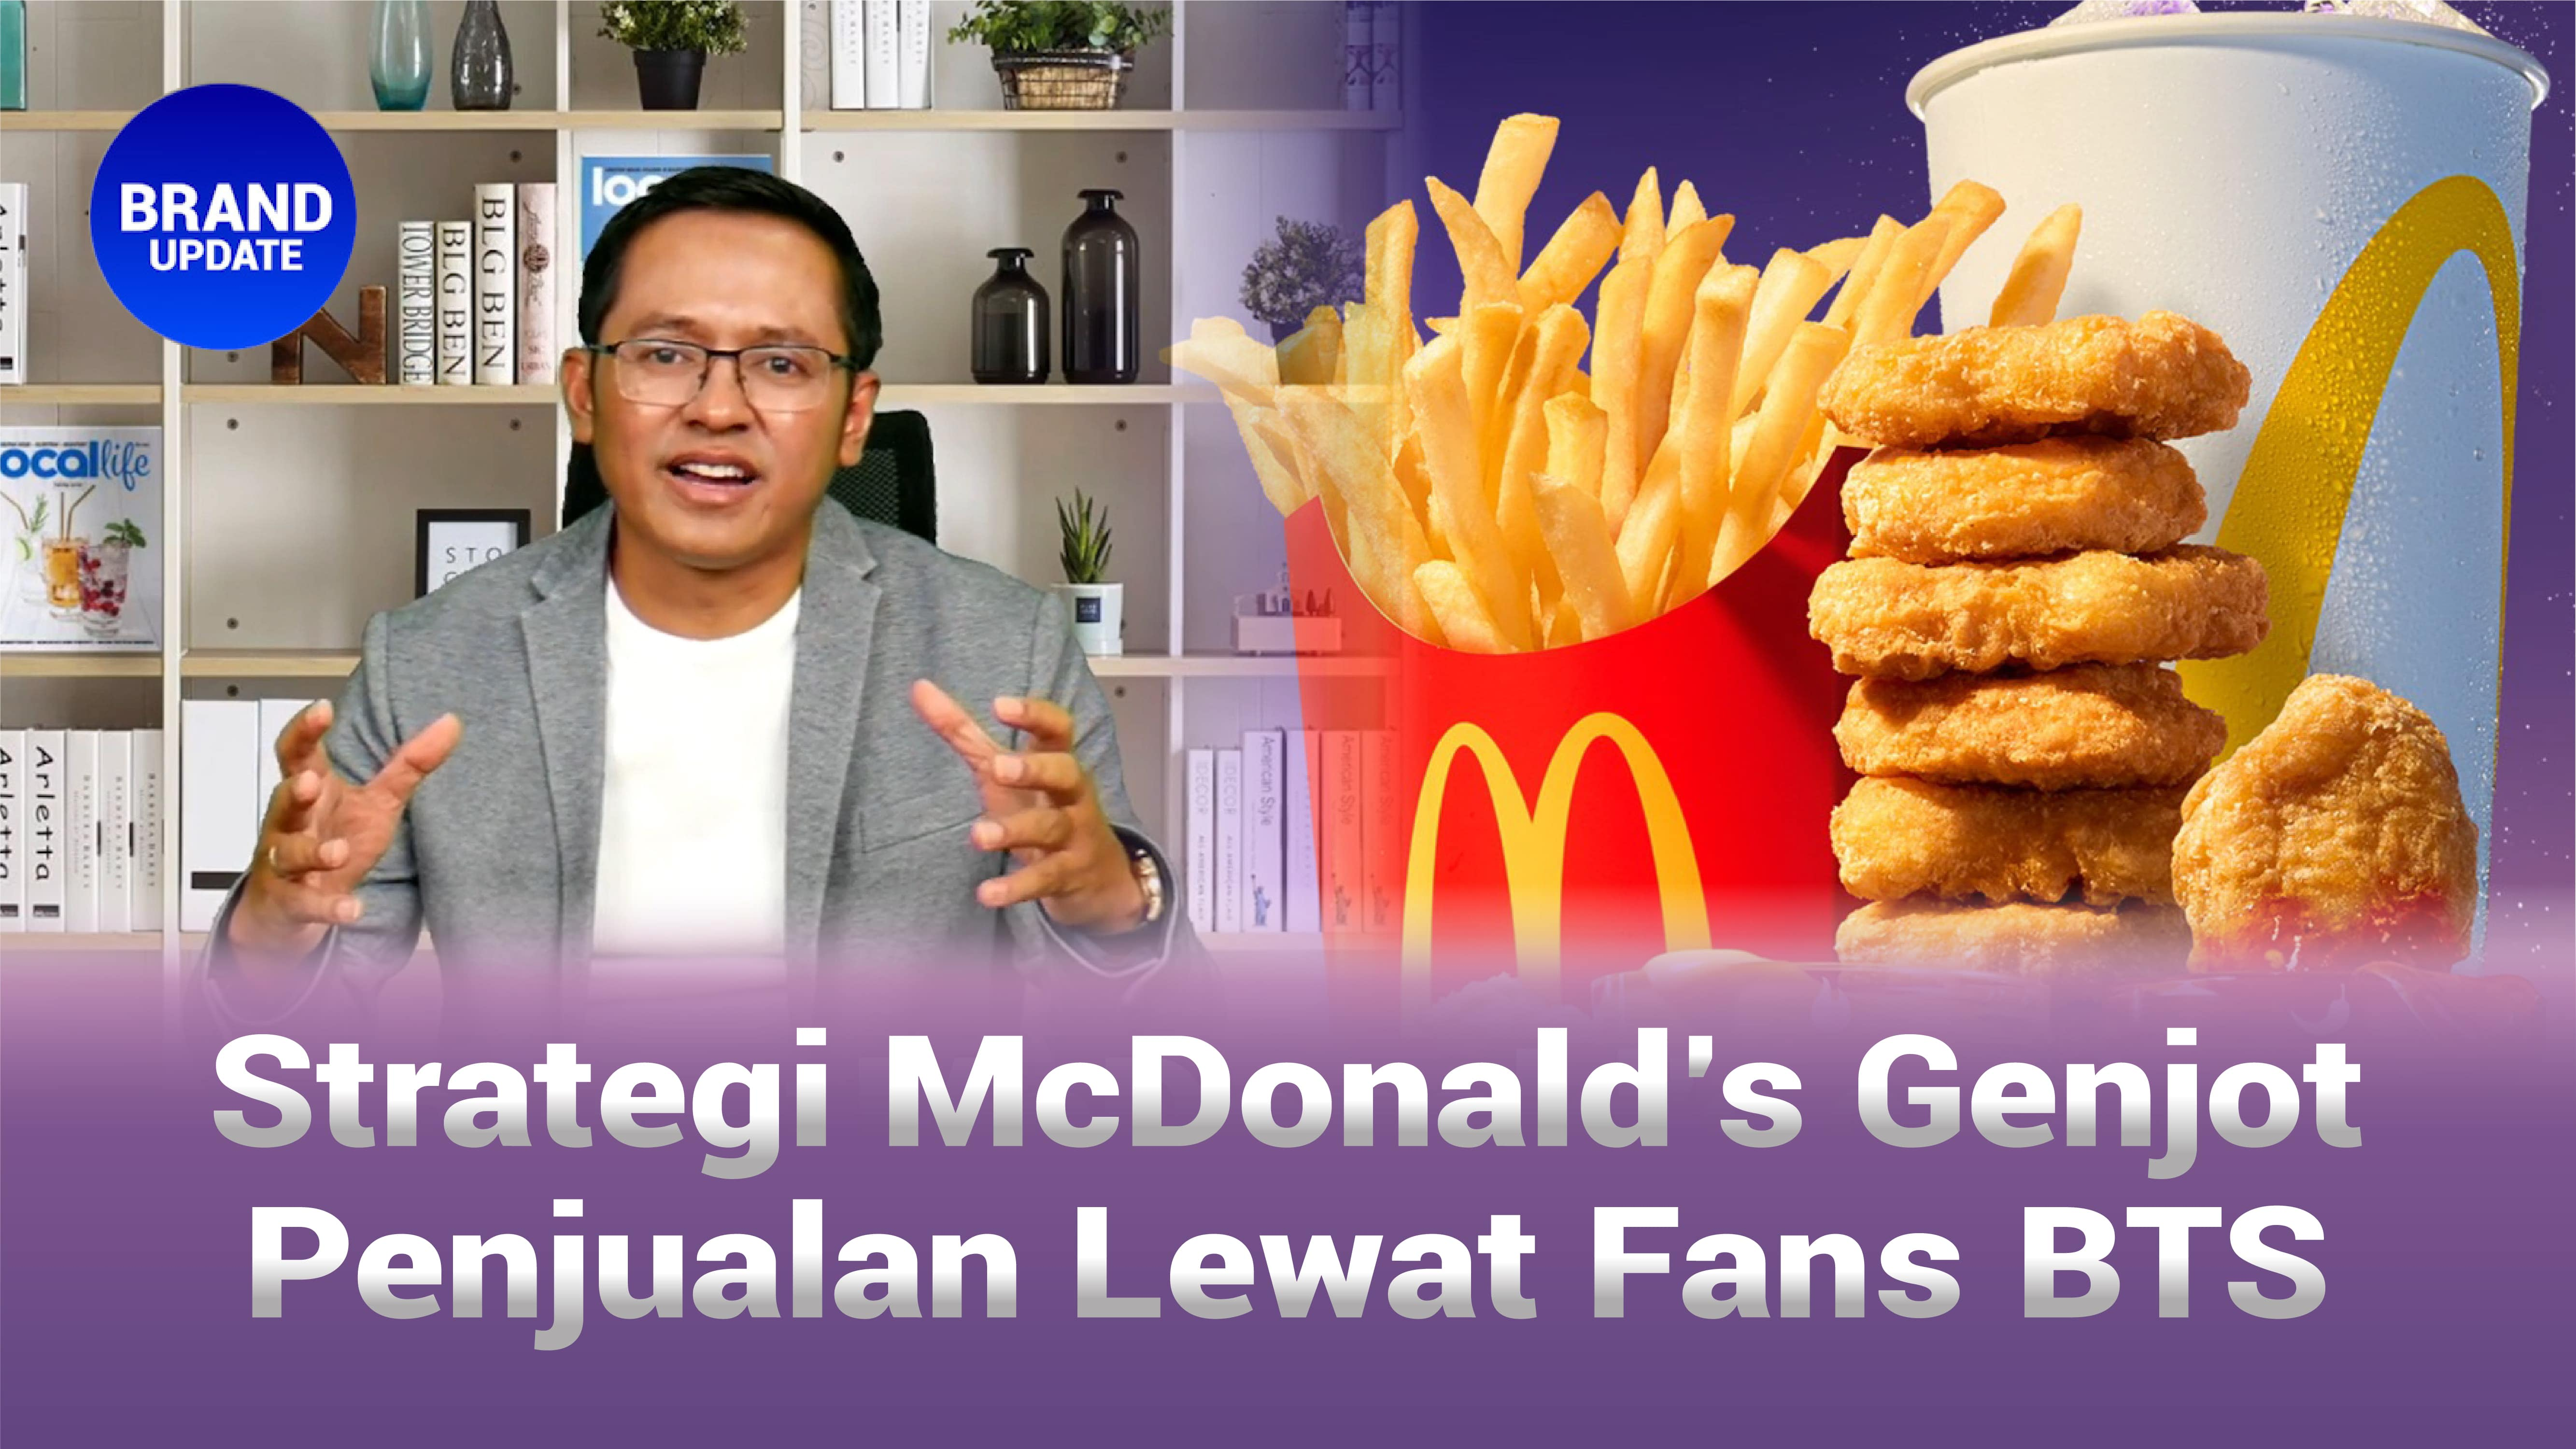 Strategi McDonalds Genjot Penjualan Lewat Fans BTS